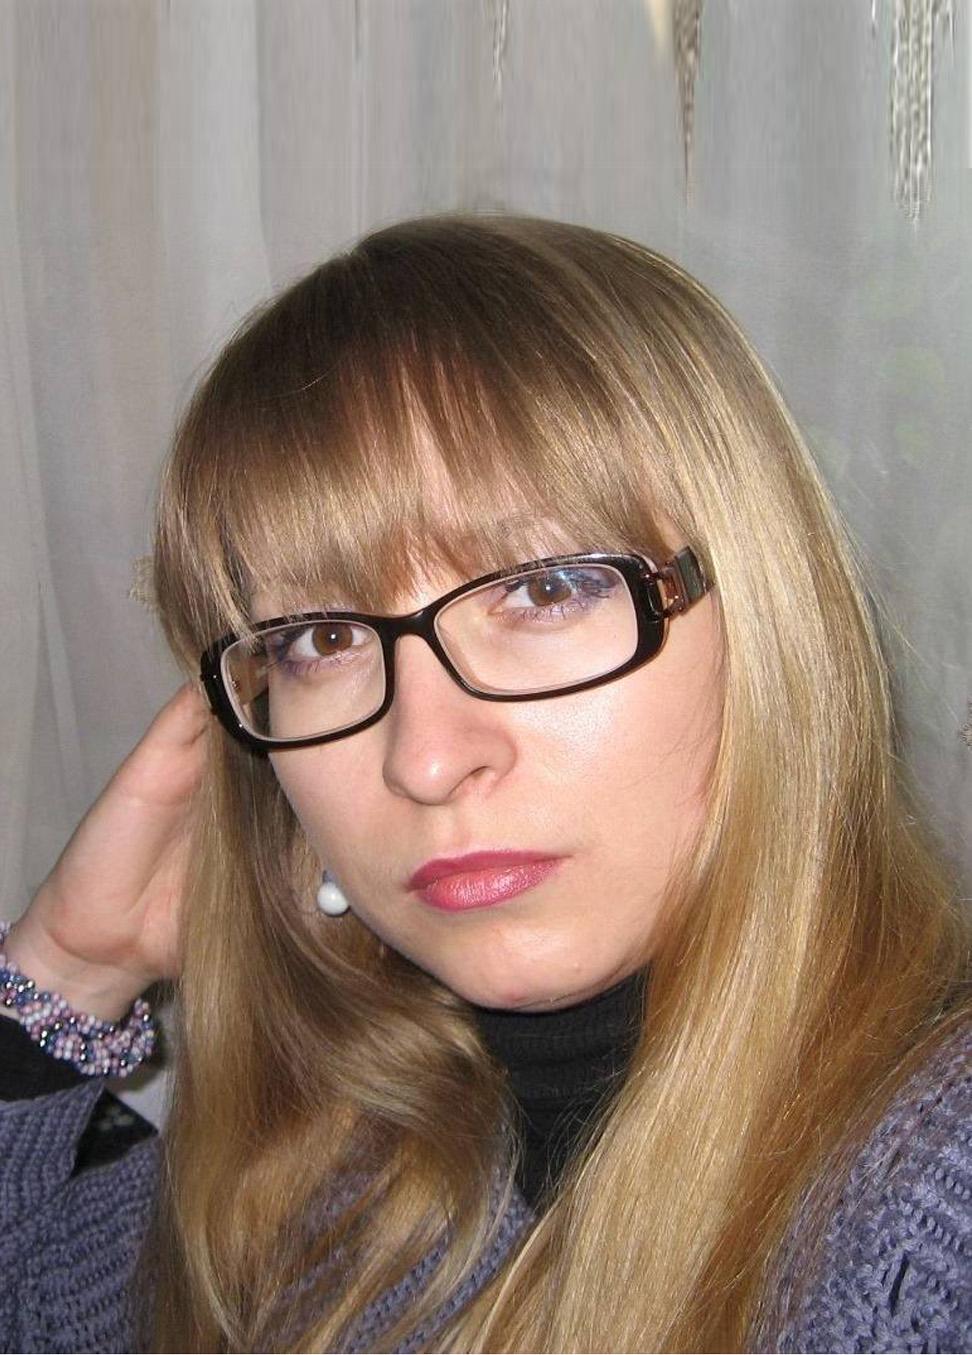 Барішенко Олена Миколаївна